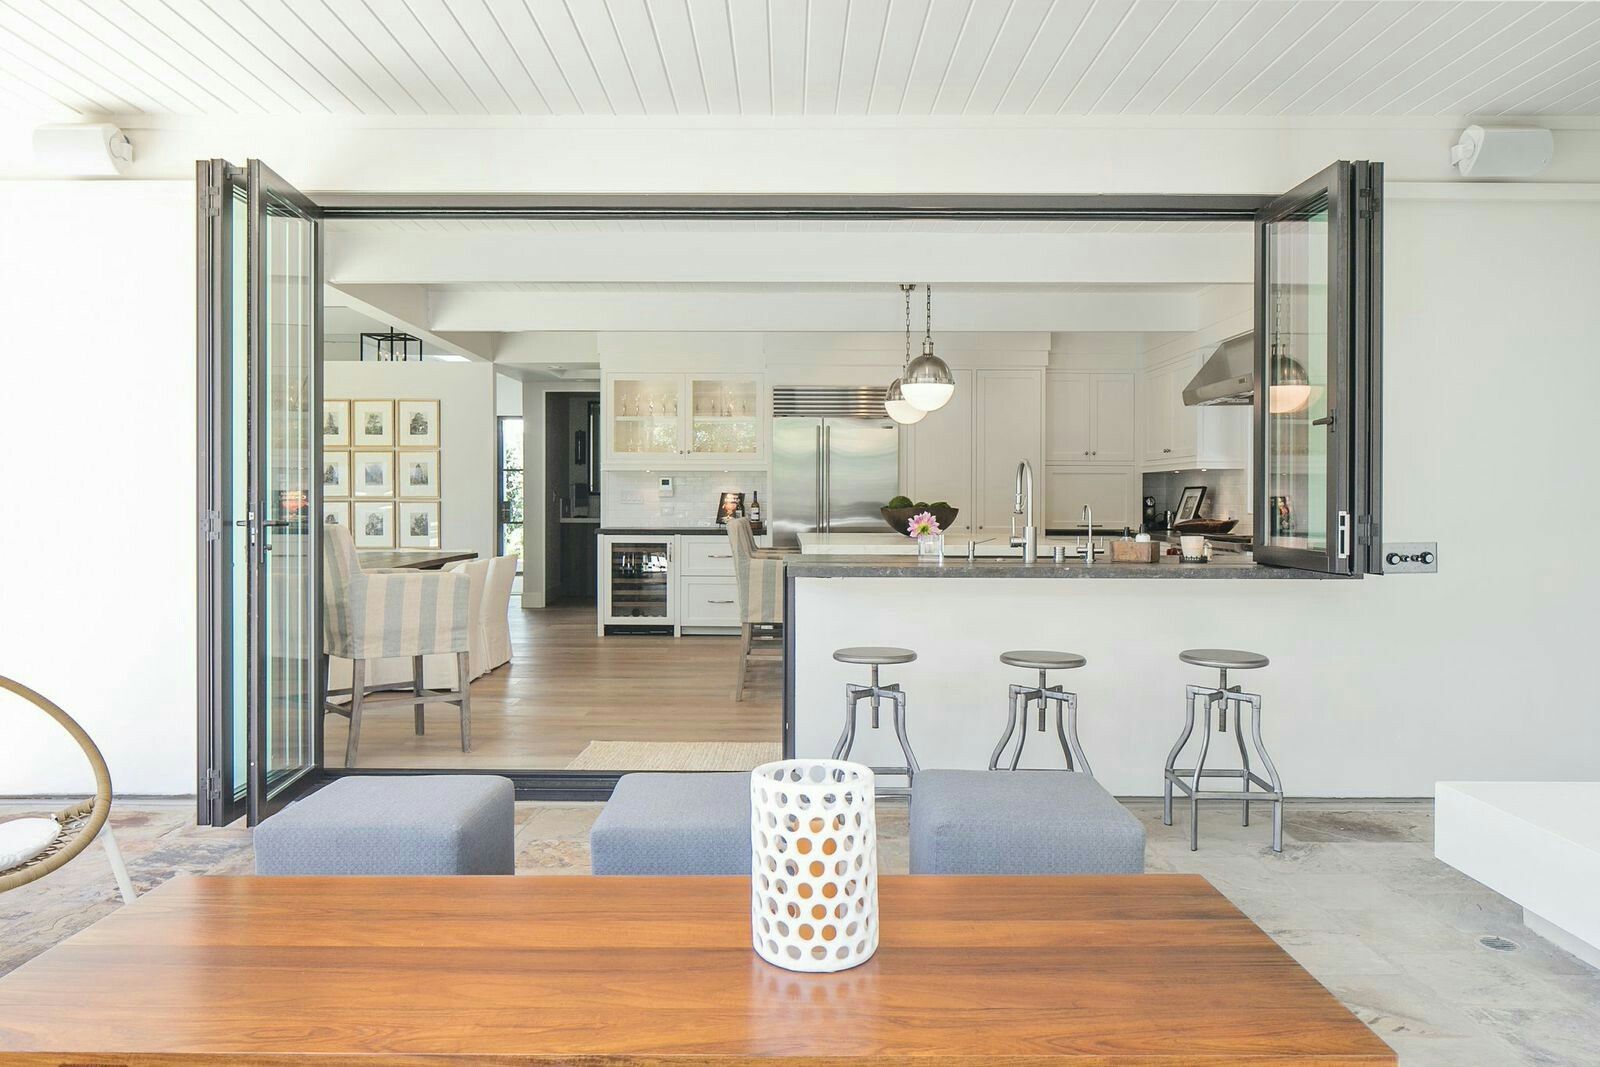 Kitchen servery window ideas  bifold window w door at kitchen  jozi home  pinterest  window